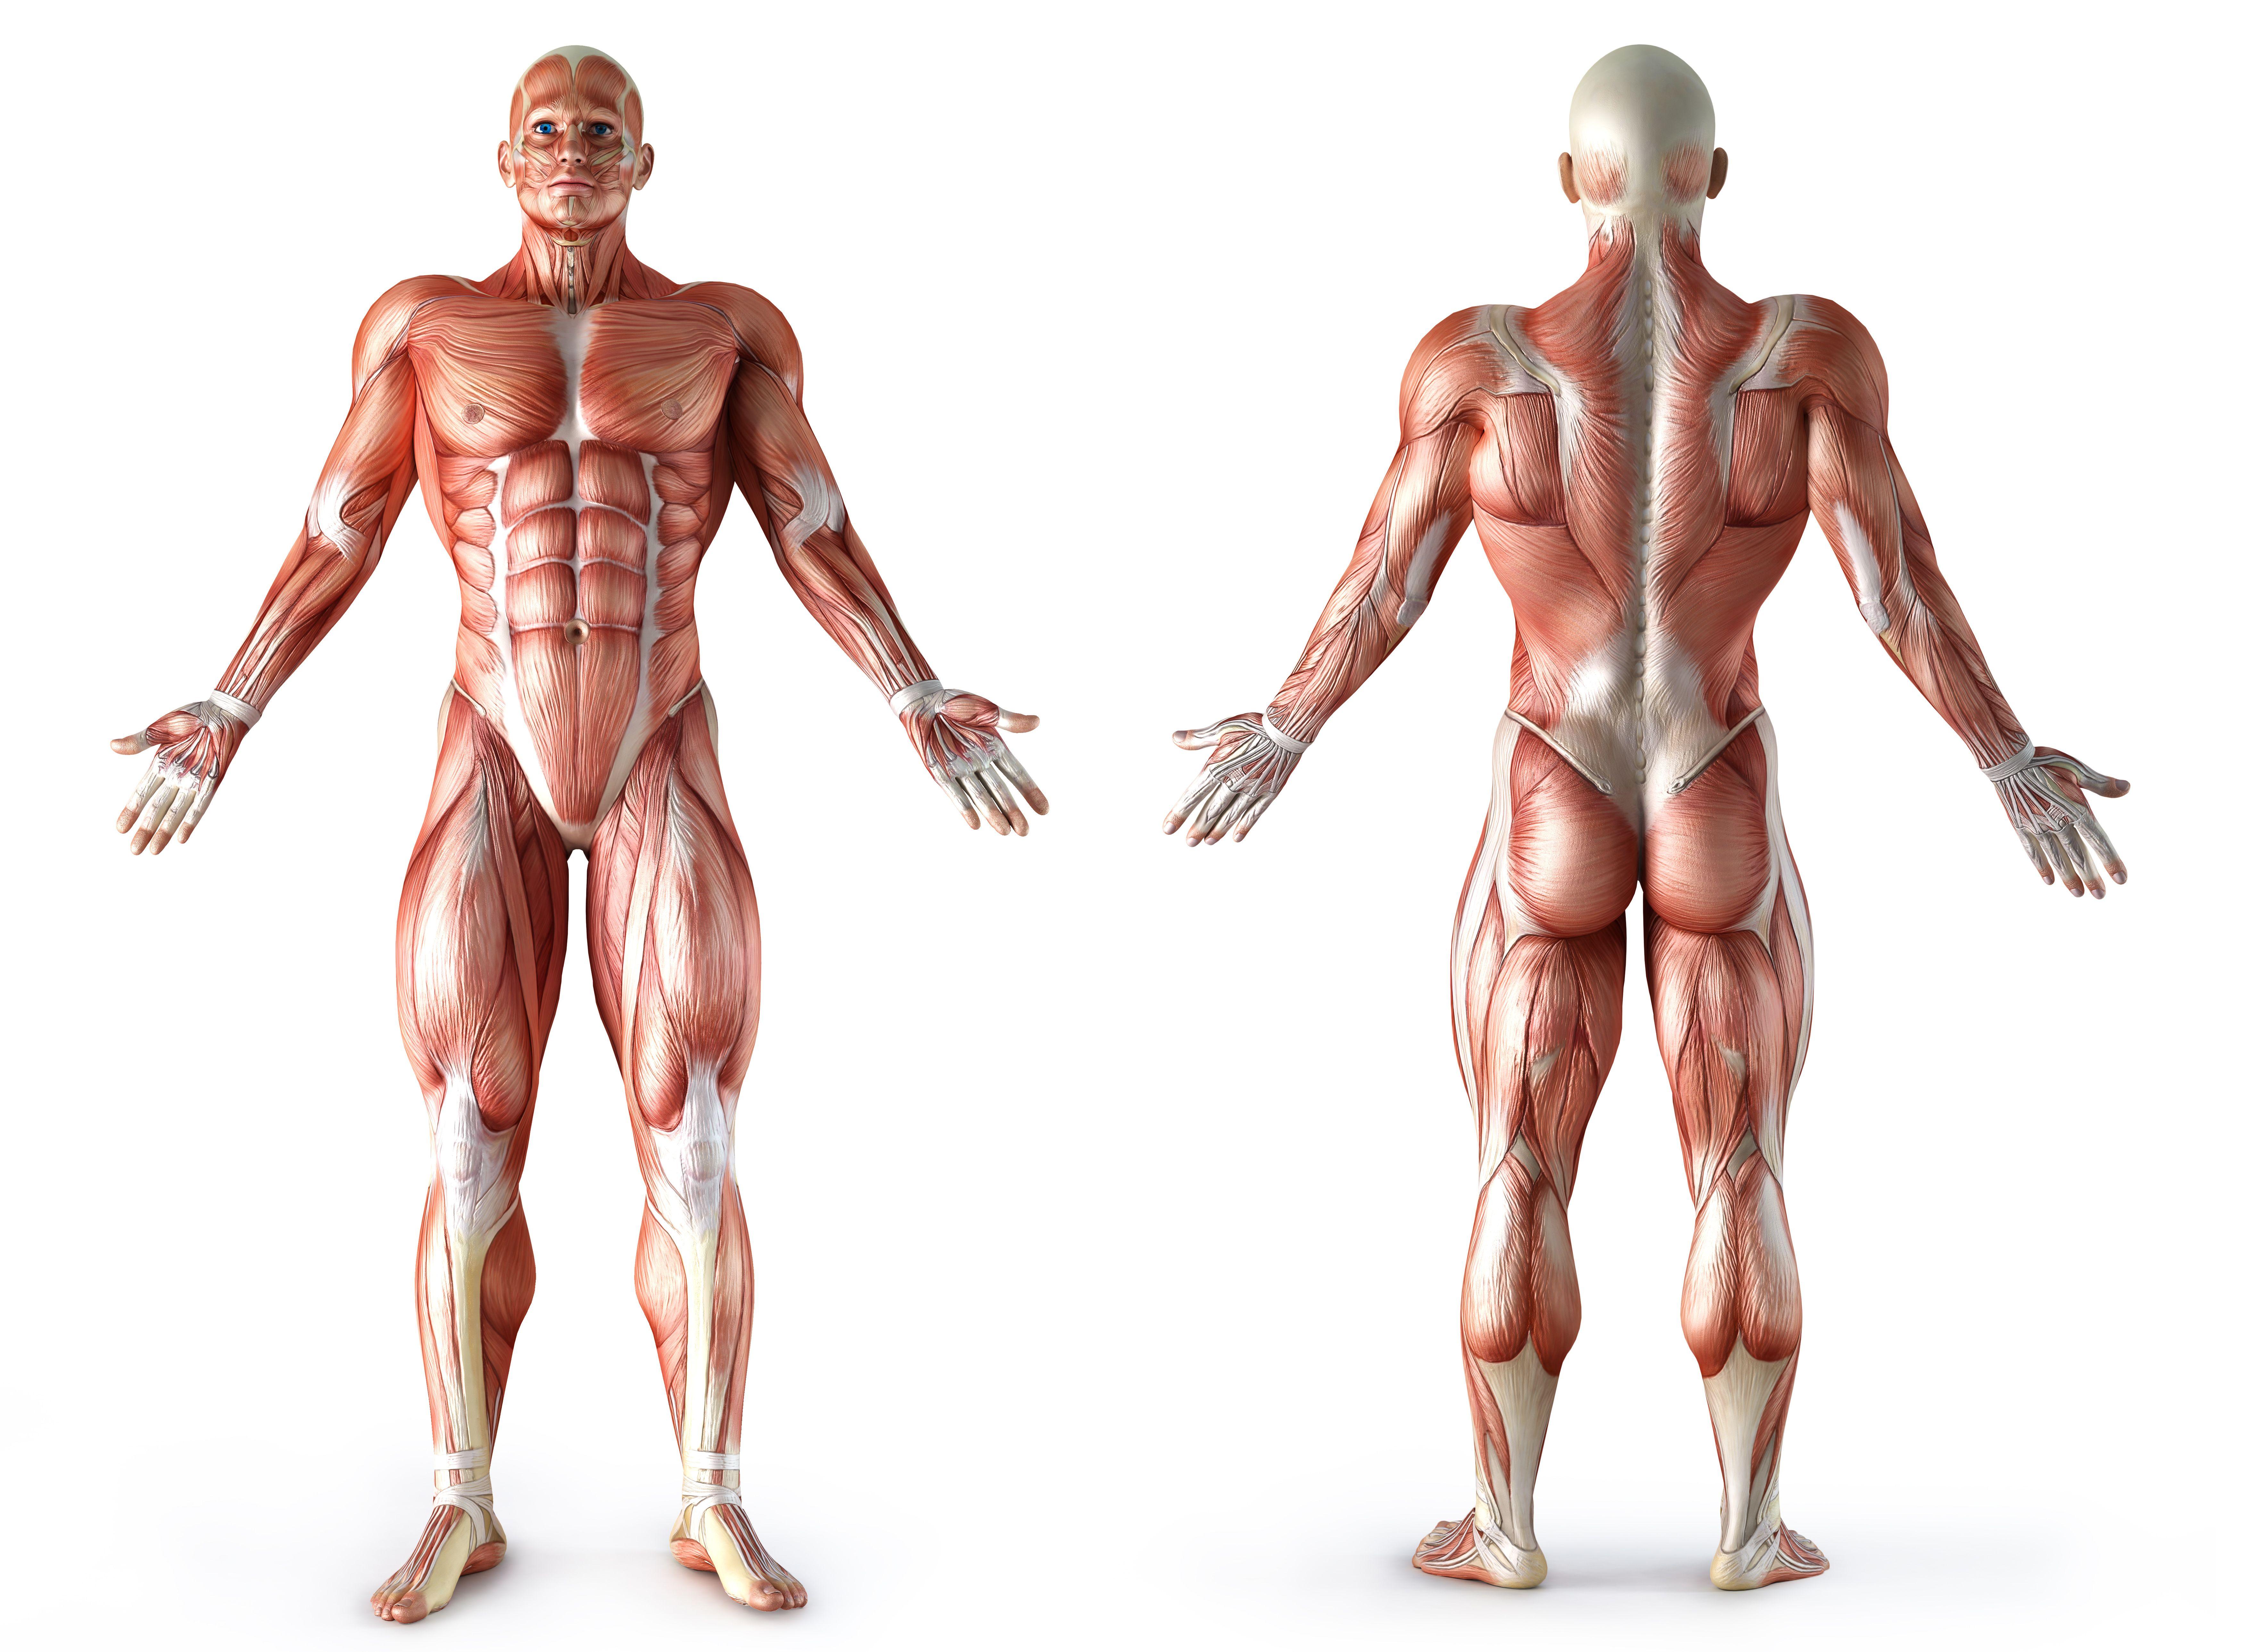 anatomy muscle | Dessin anatomie | Pinterest | Anatomy